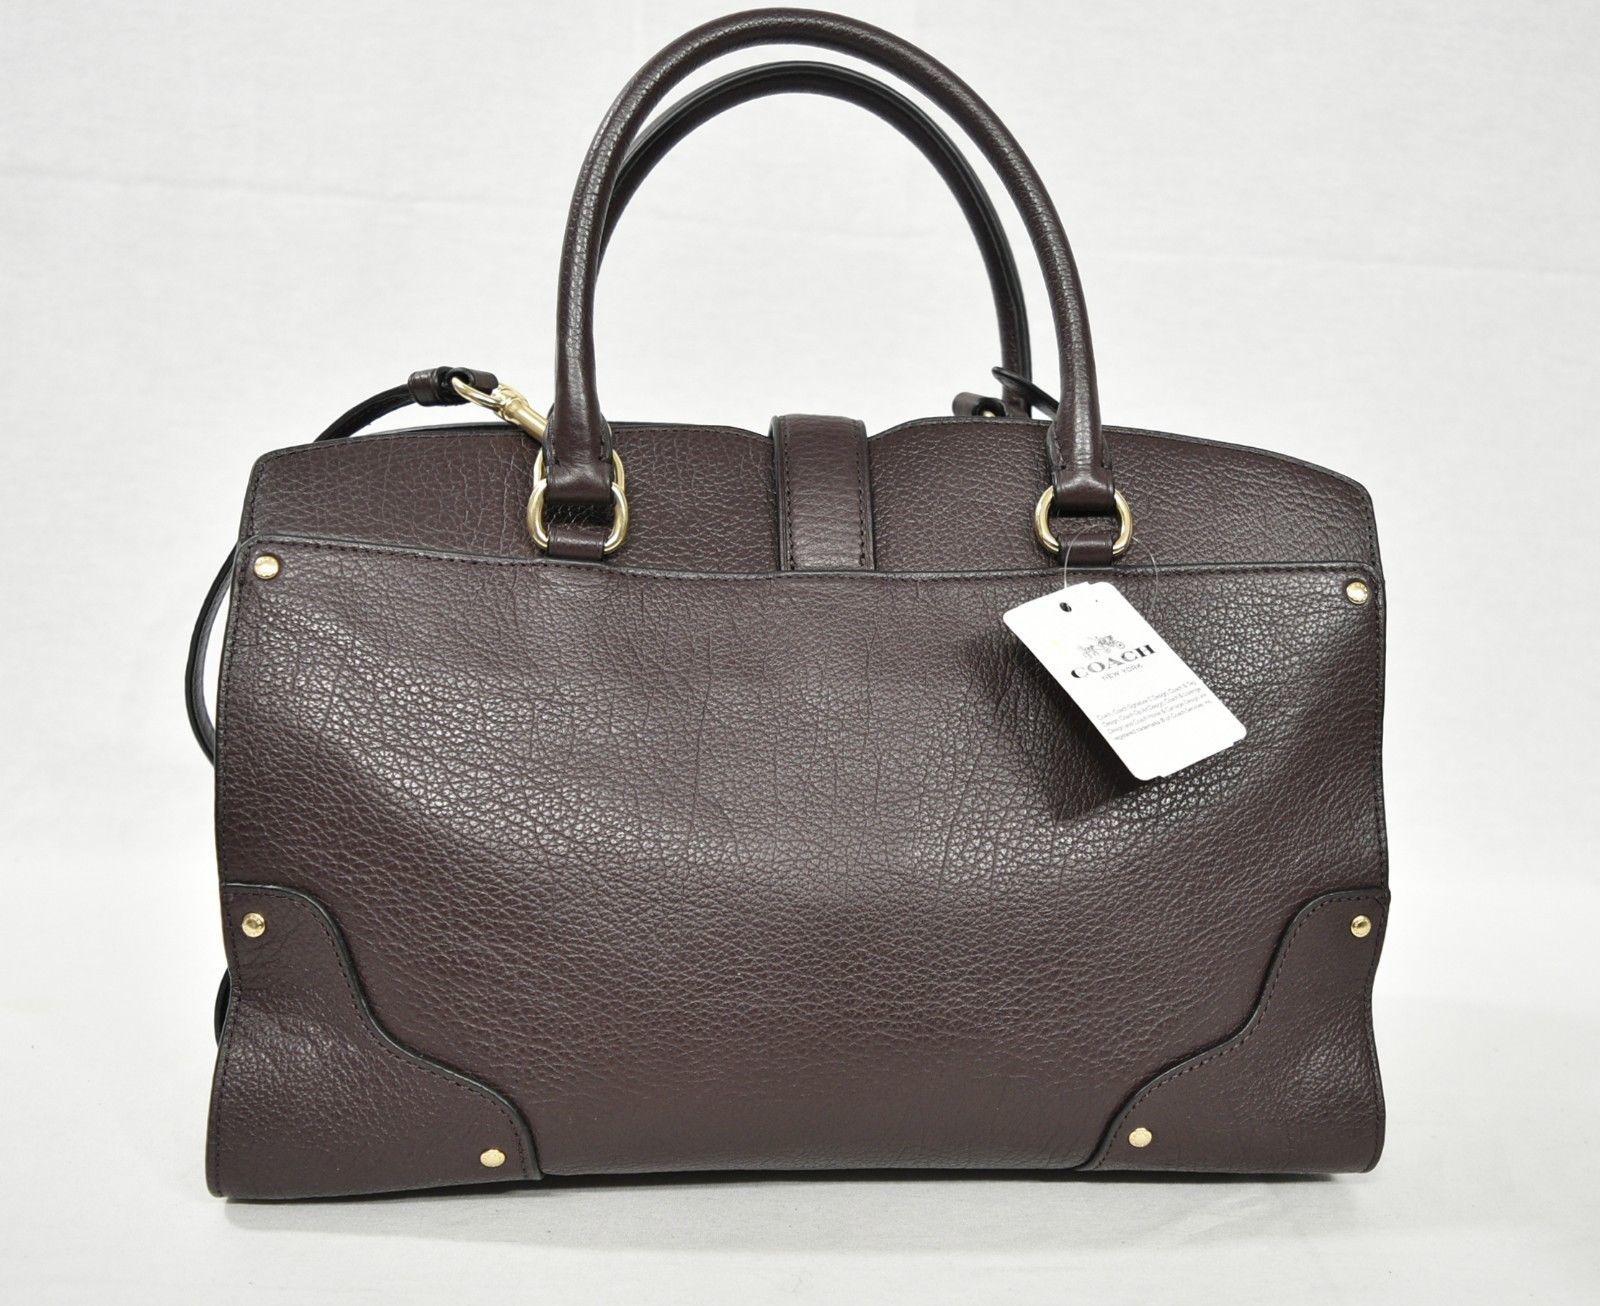 256e72806b15 NWT Coach 37575 Grain Leather Mercer 30 Satchel Shoulder Bag in Oxblood